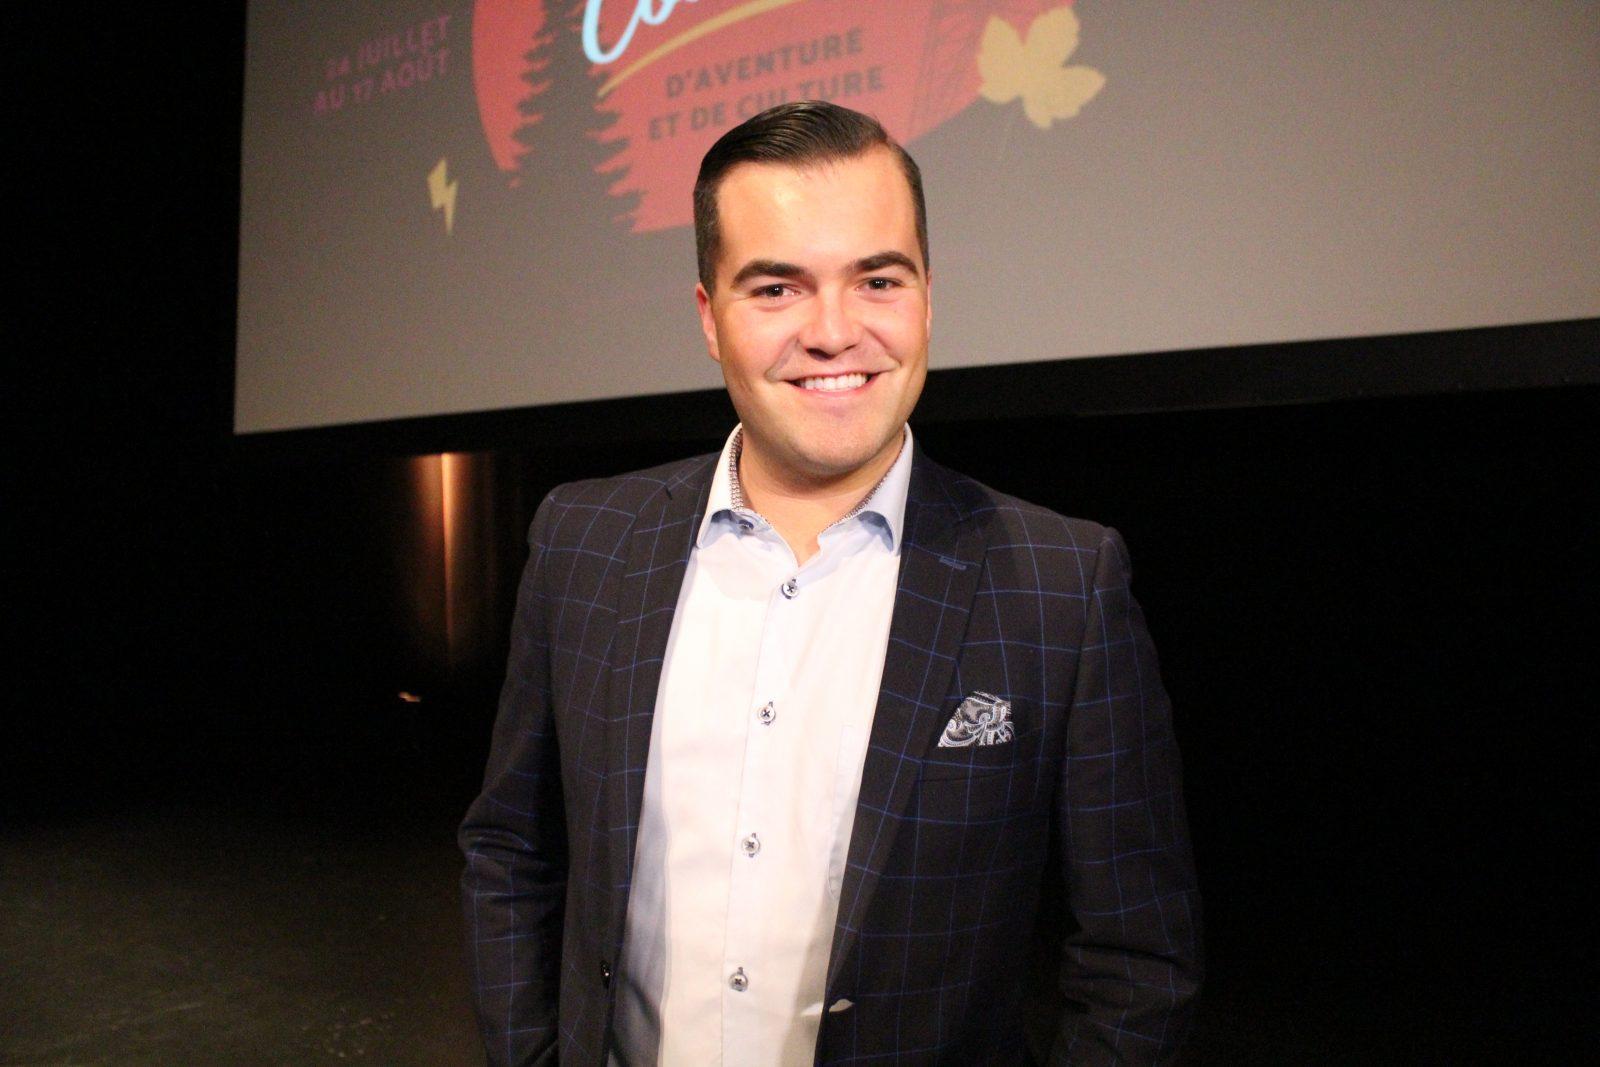 Québec verse 240 000 $ à Chaud Bizzz